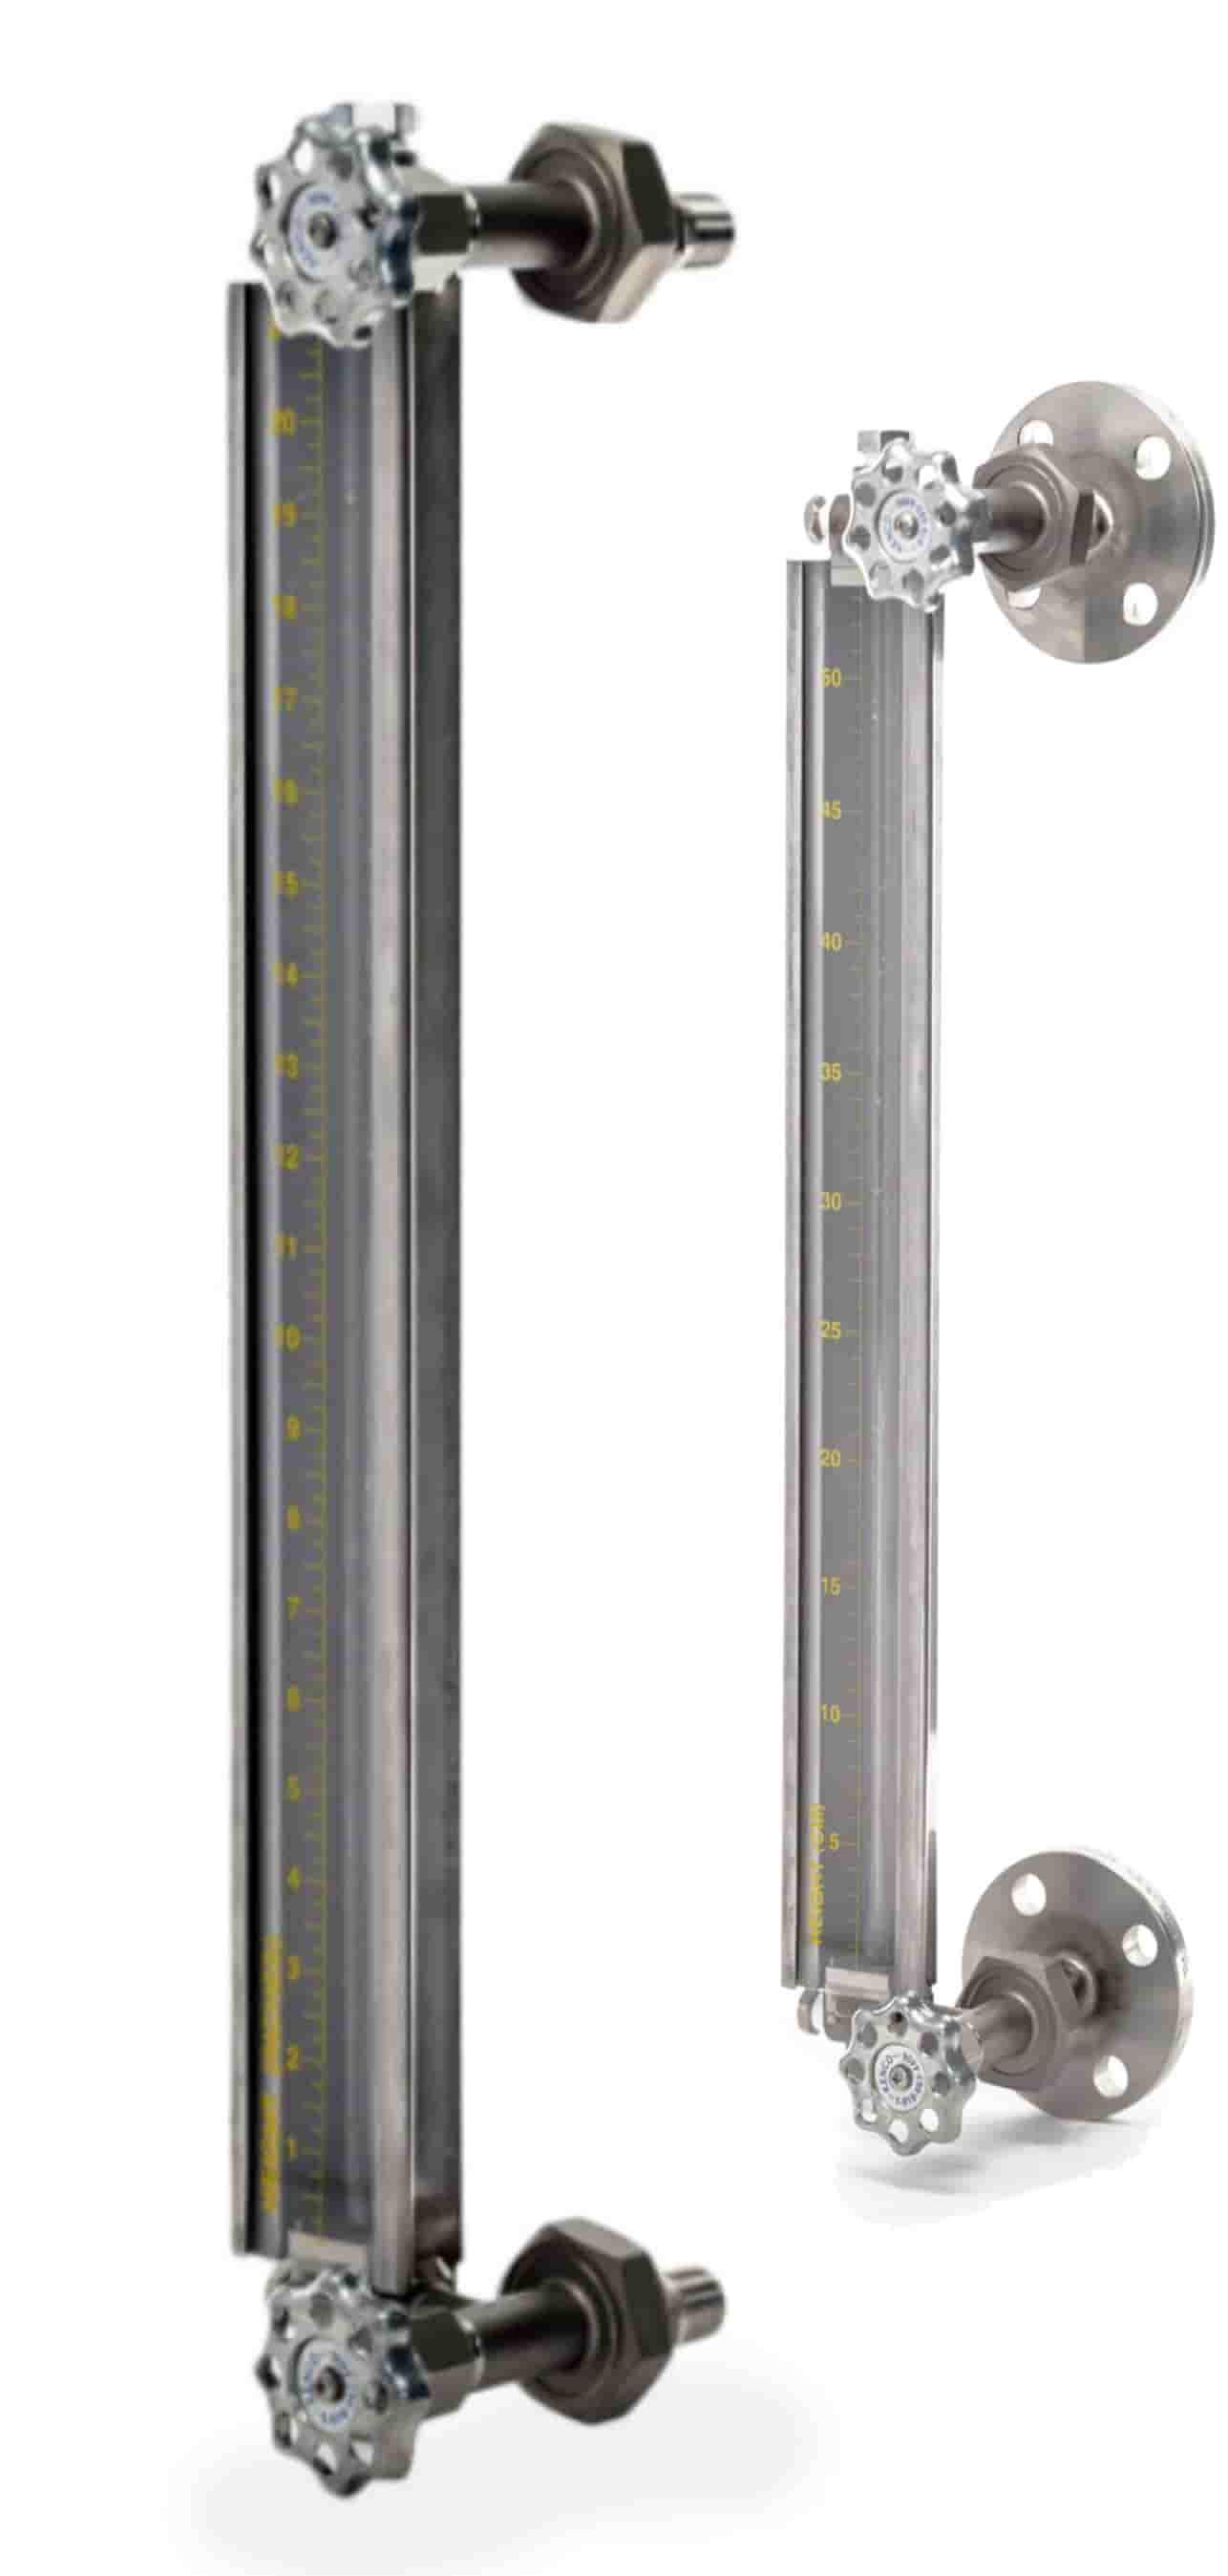 KENCO K9900 SERIES Tubular Liquid Level Gauges For Bulk Tanks,Marine,  Cooling Towers,